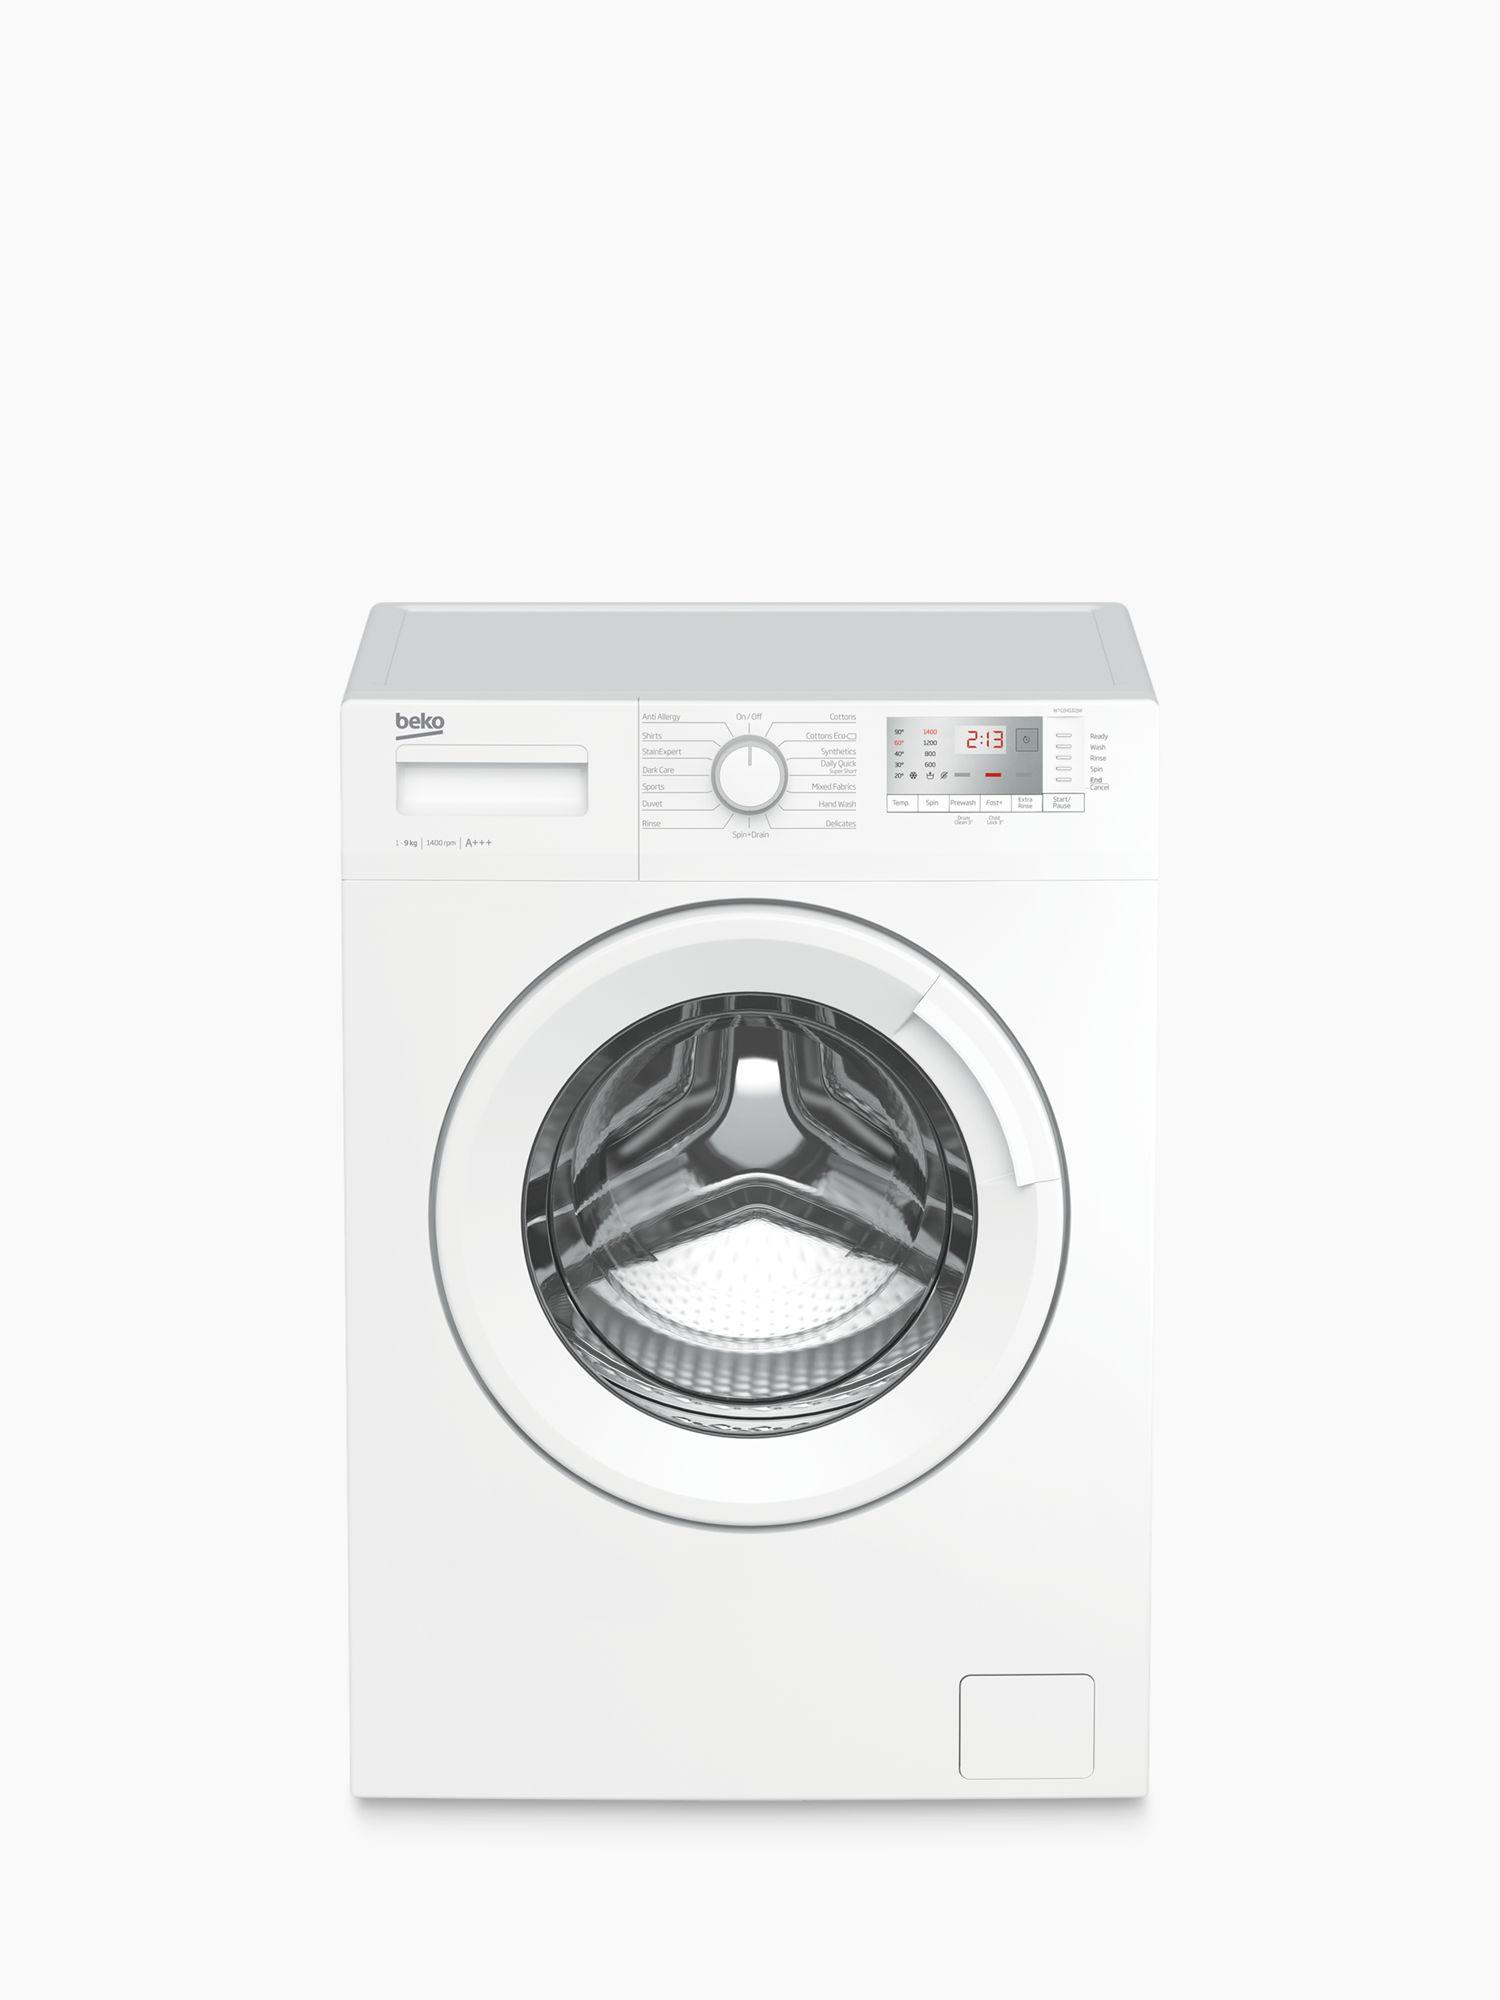 Beko Beko WTG941B2JW Freestanding Washing Machine, 9kg Load, A+++ Energy Rating, 1400rpm Spin, White